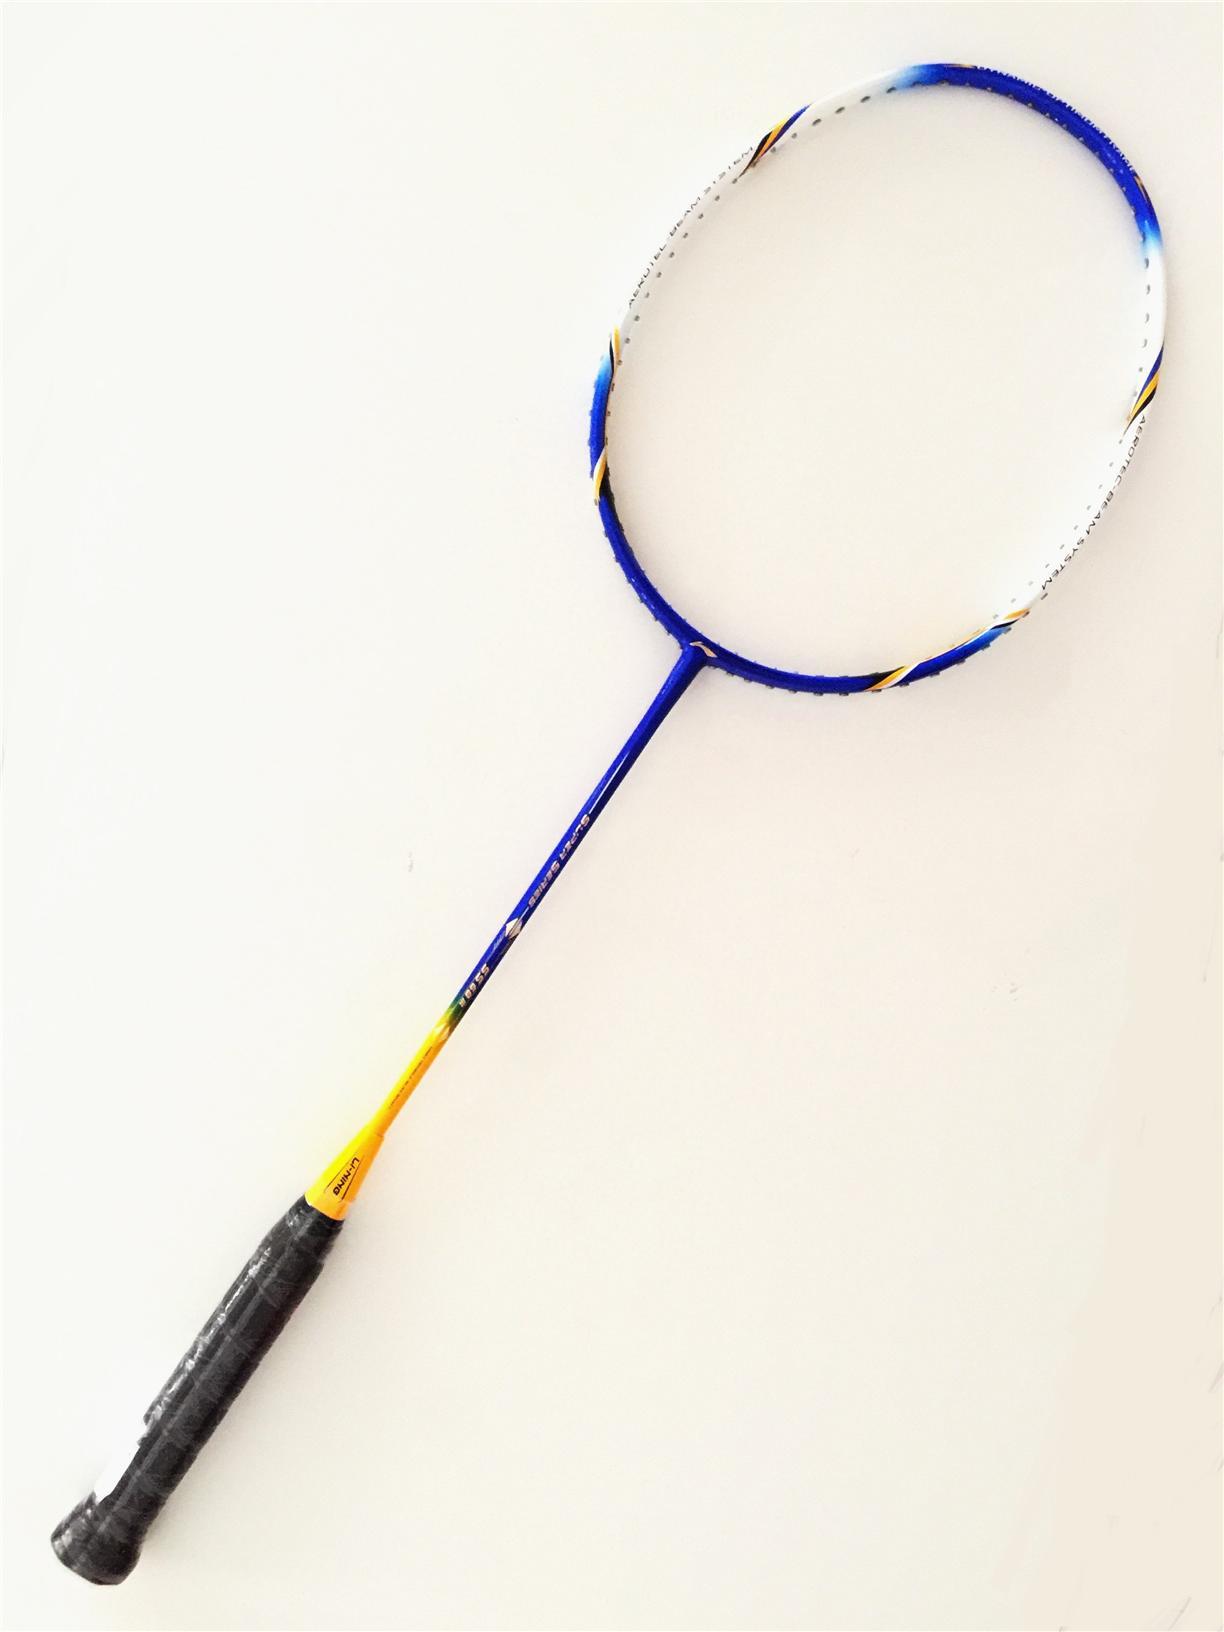 li ning badminton racket ss68 iii end 5 3 2017 3 15 pm